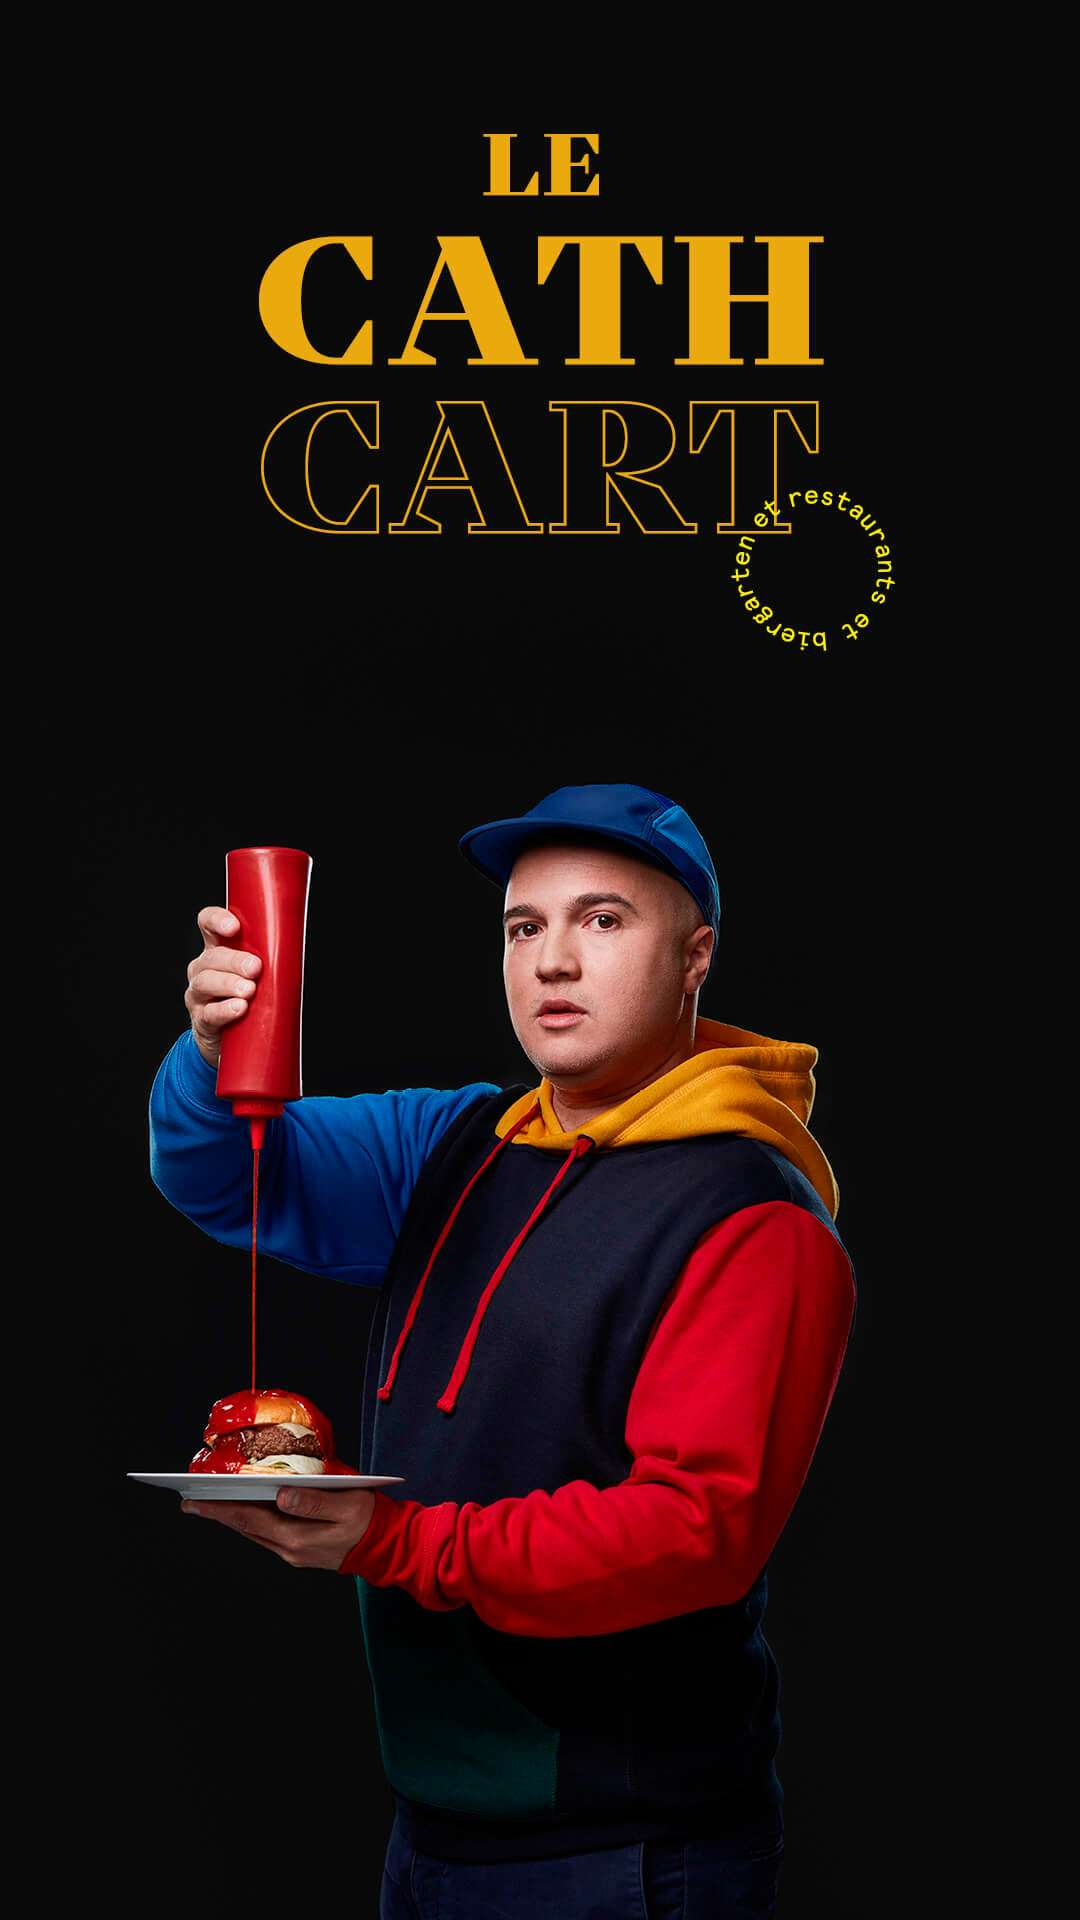 Younes Bengeloune by Jocelyn Michel for Cathcart restaurant